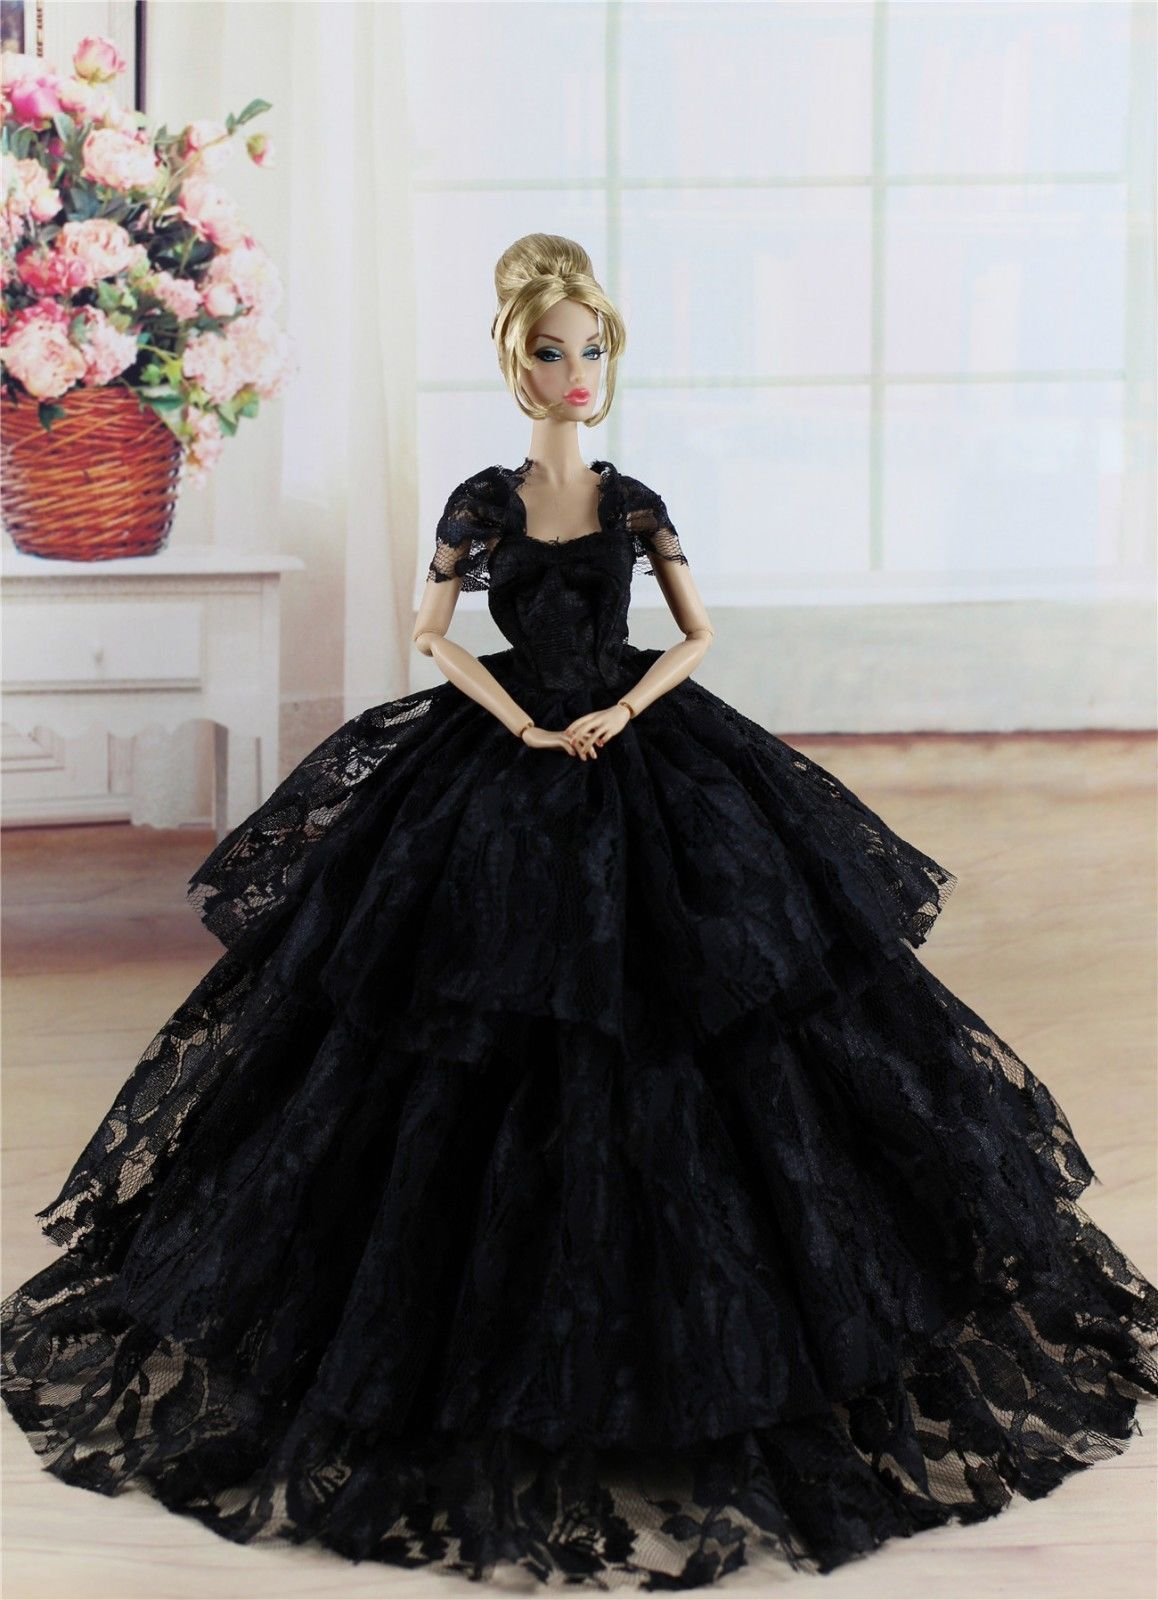 Fashion Royalty Black Princess Dress Gown Clothes For 11 5in Doll C050 Dress Barbie Doll Barbie Gowns Black Princess Dress [ 1600 x 1158 Pixel ]